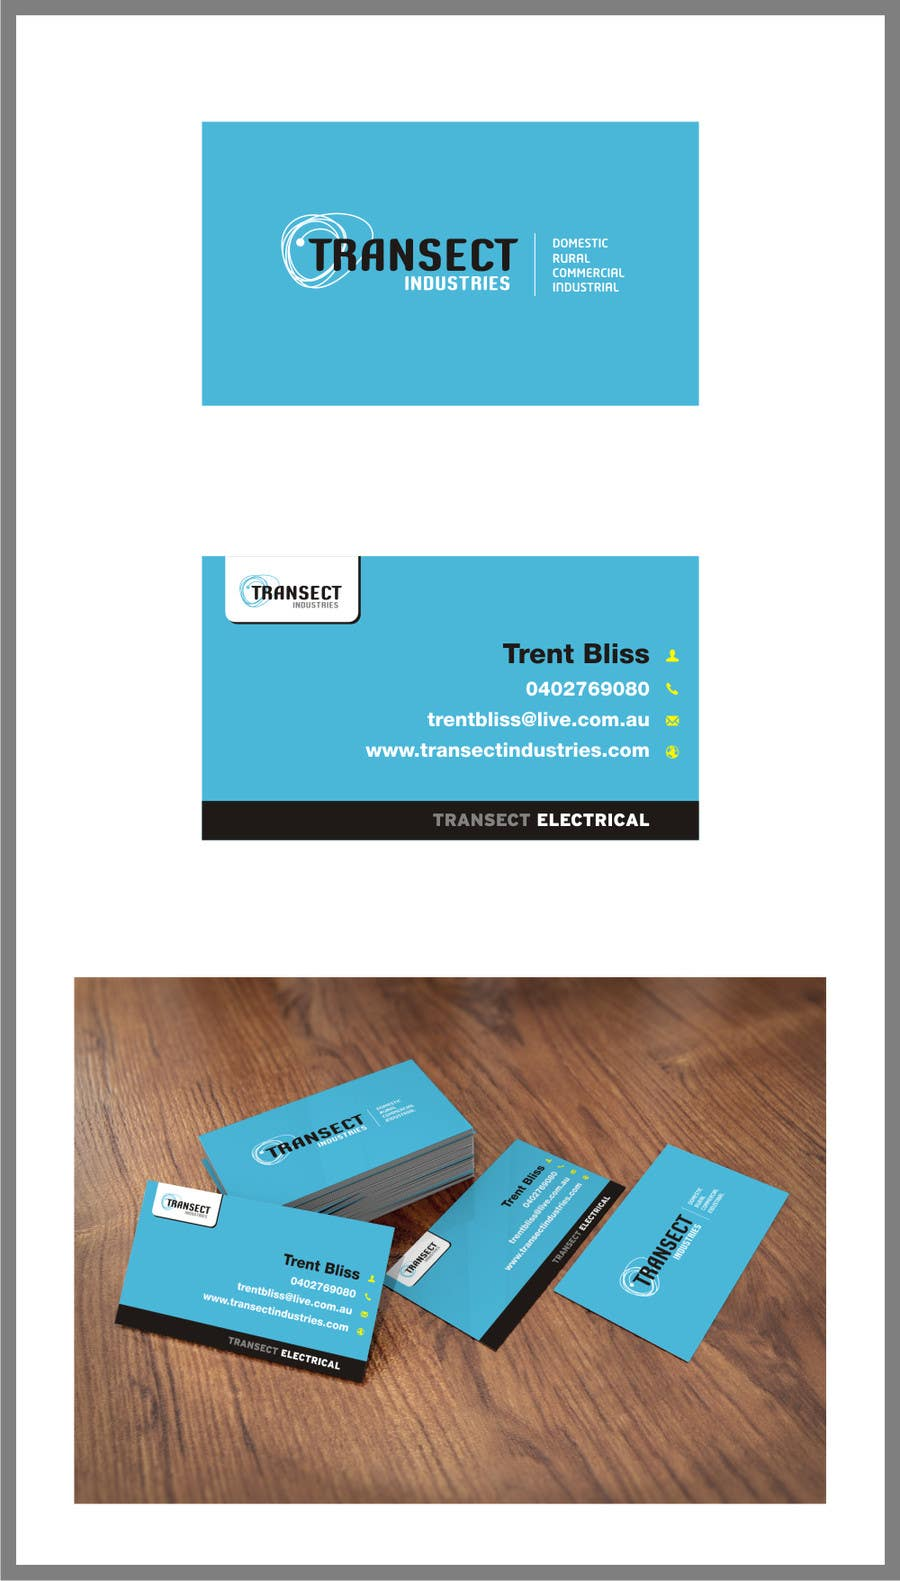 Bài tham dự cuộc thi #                                        47                                      cho                                         Business Card Design for Transect Industries